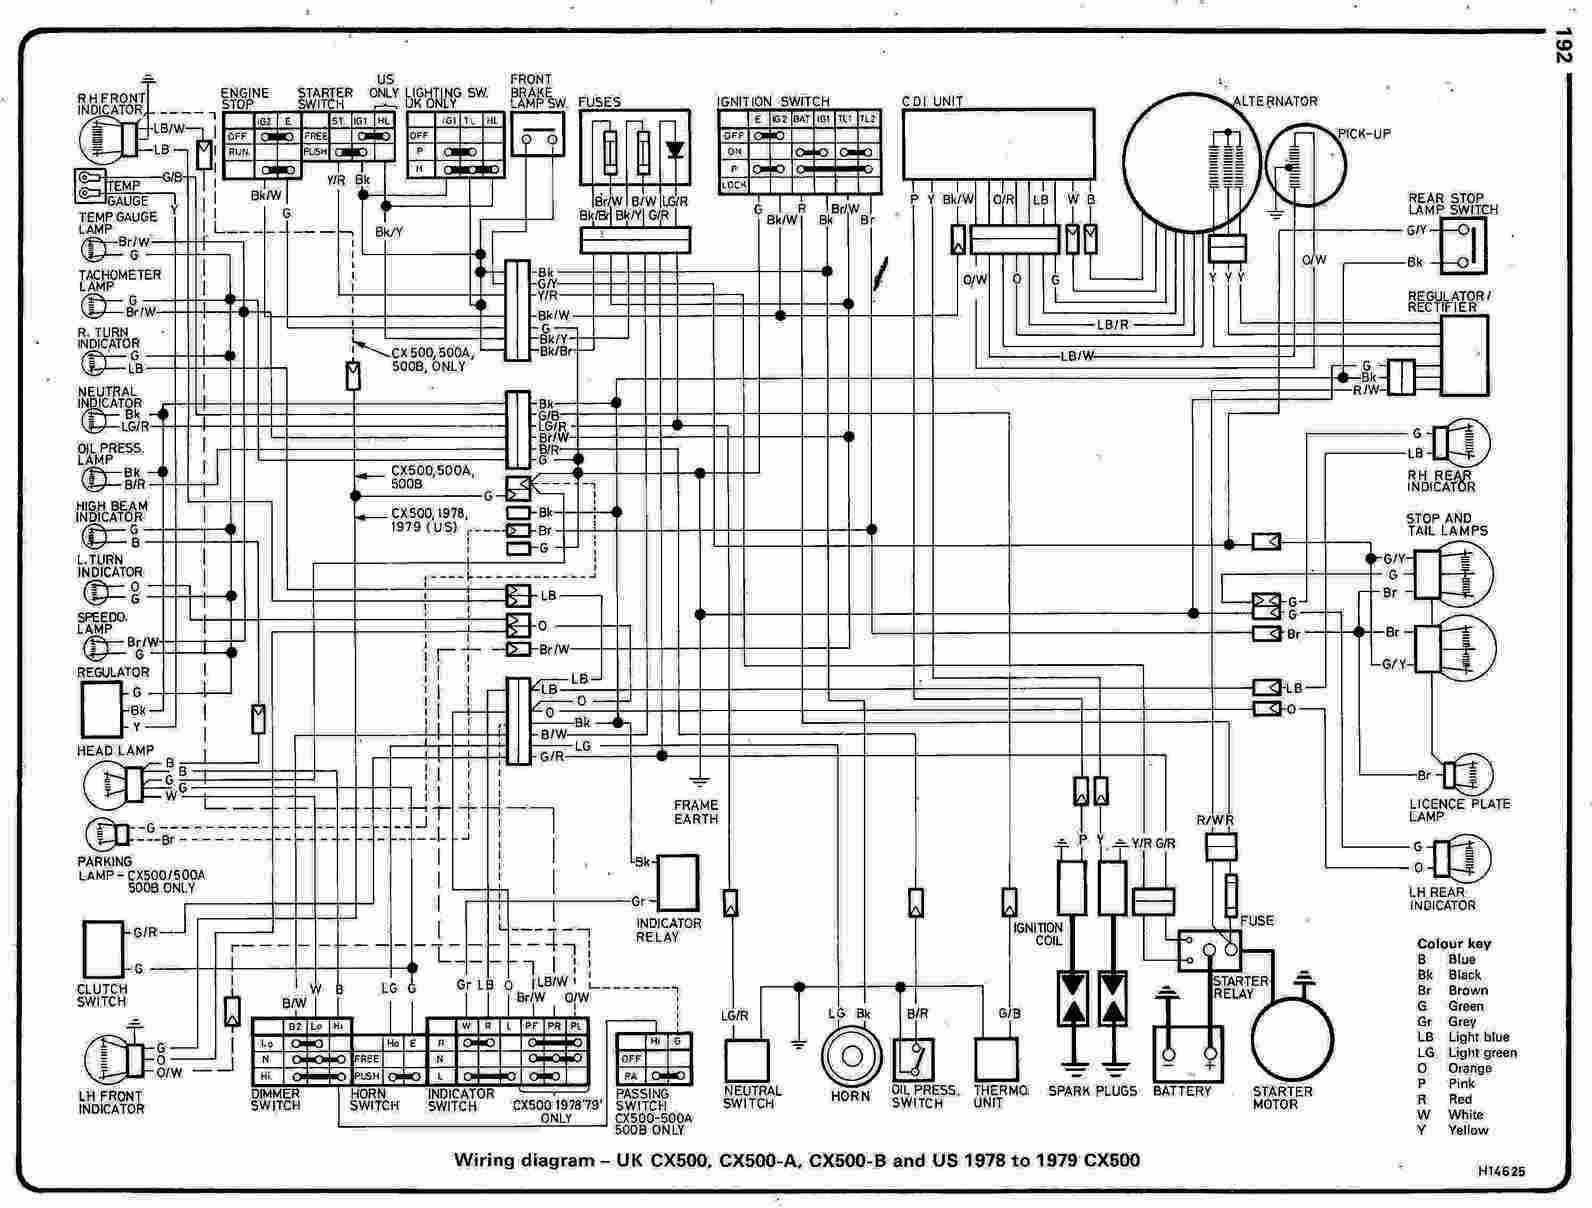 Honda CX500 Motorcycle 1978-1979 Complete Wiring Diagram